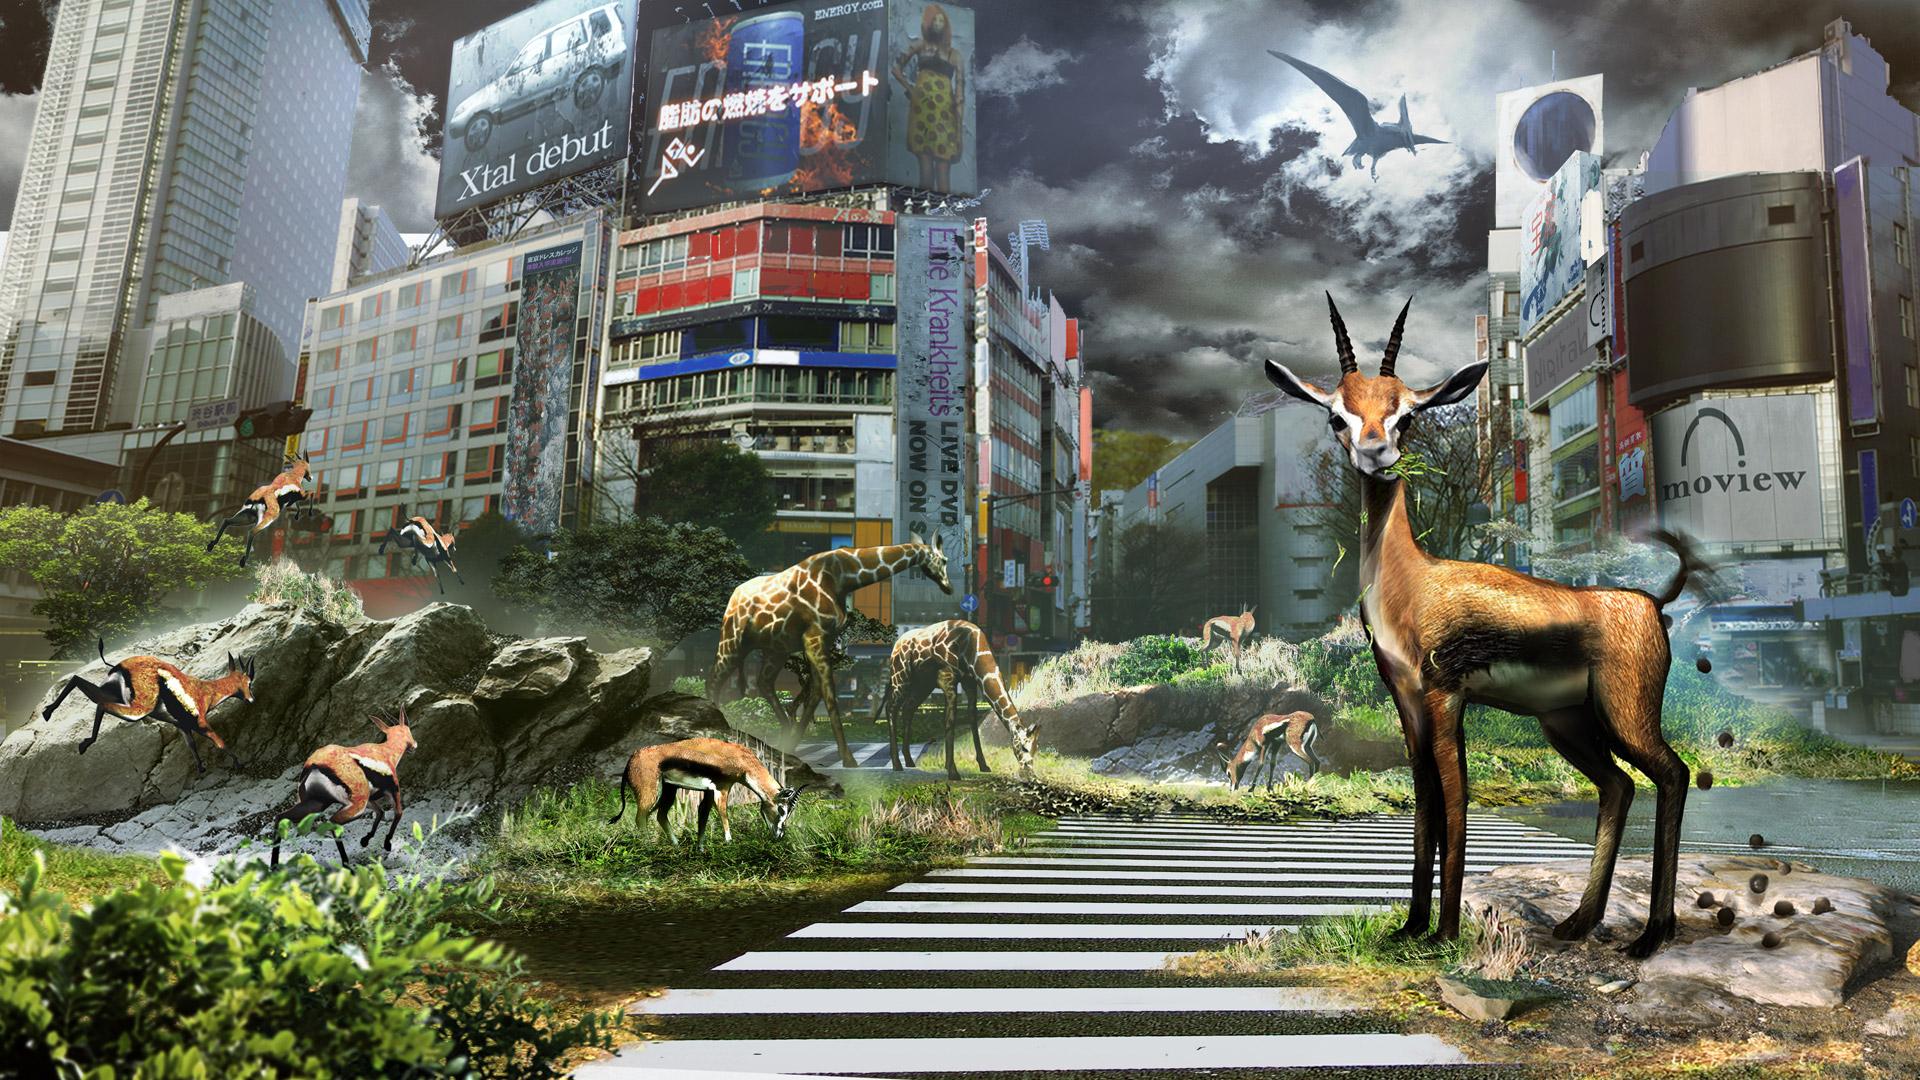 Free Tokyo Jungle Wallpaper in 1920x1080